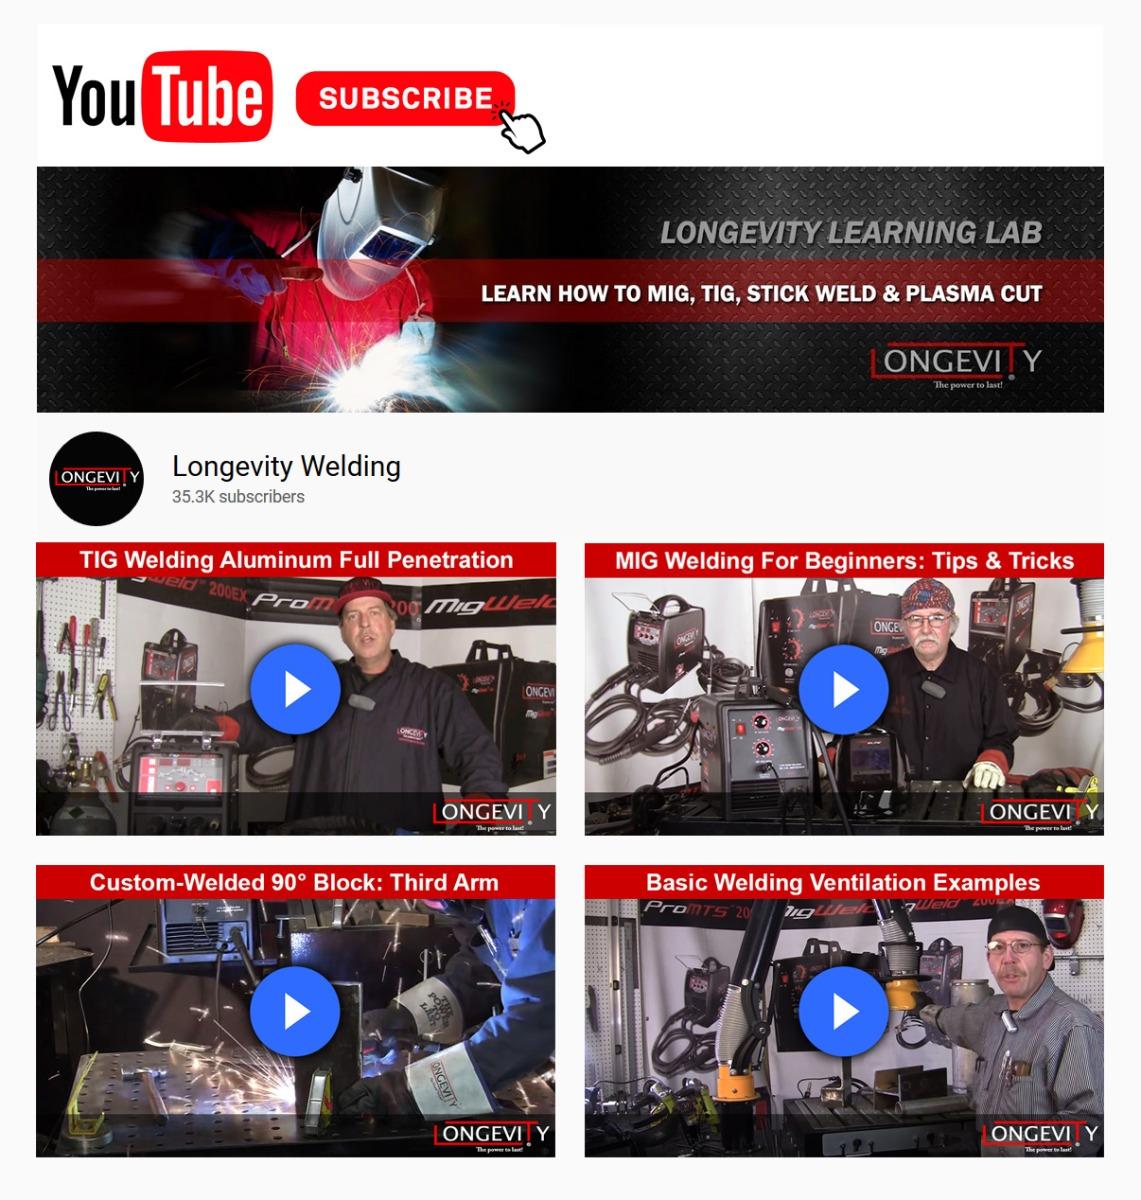 Subscribe to Longevity on YouTube